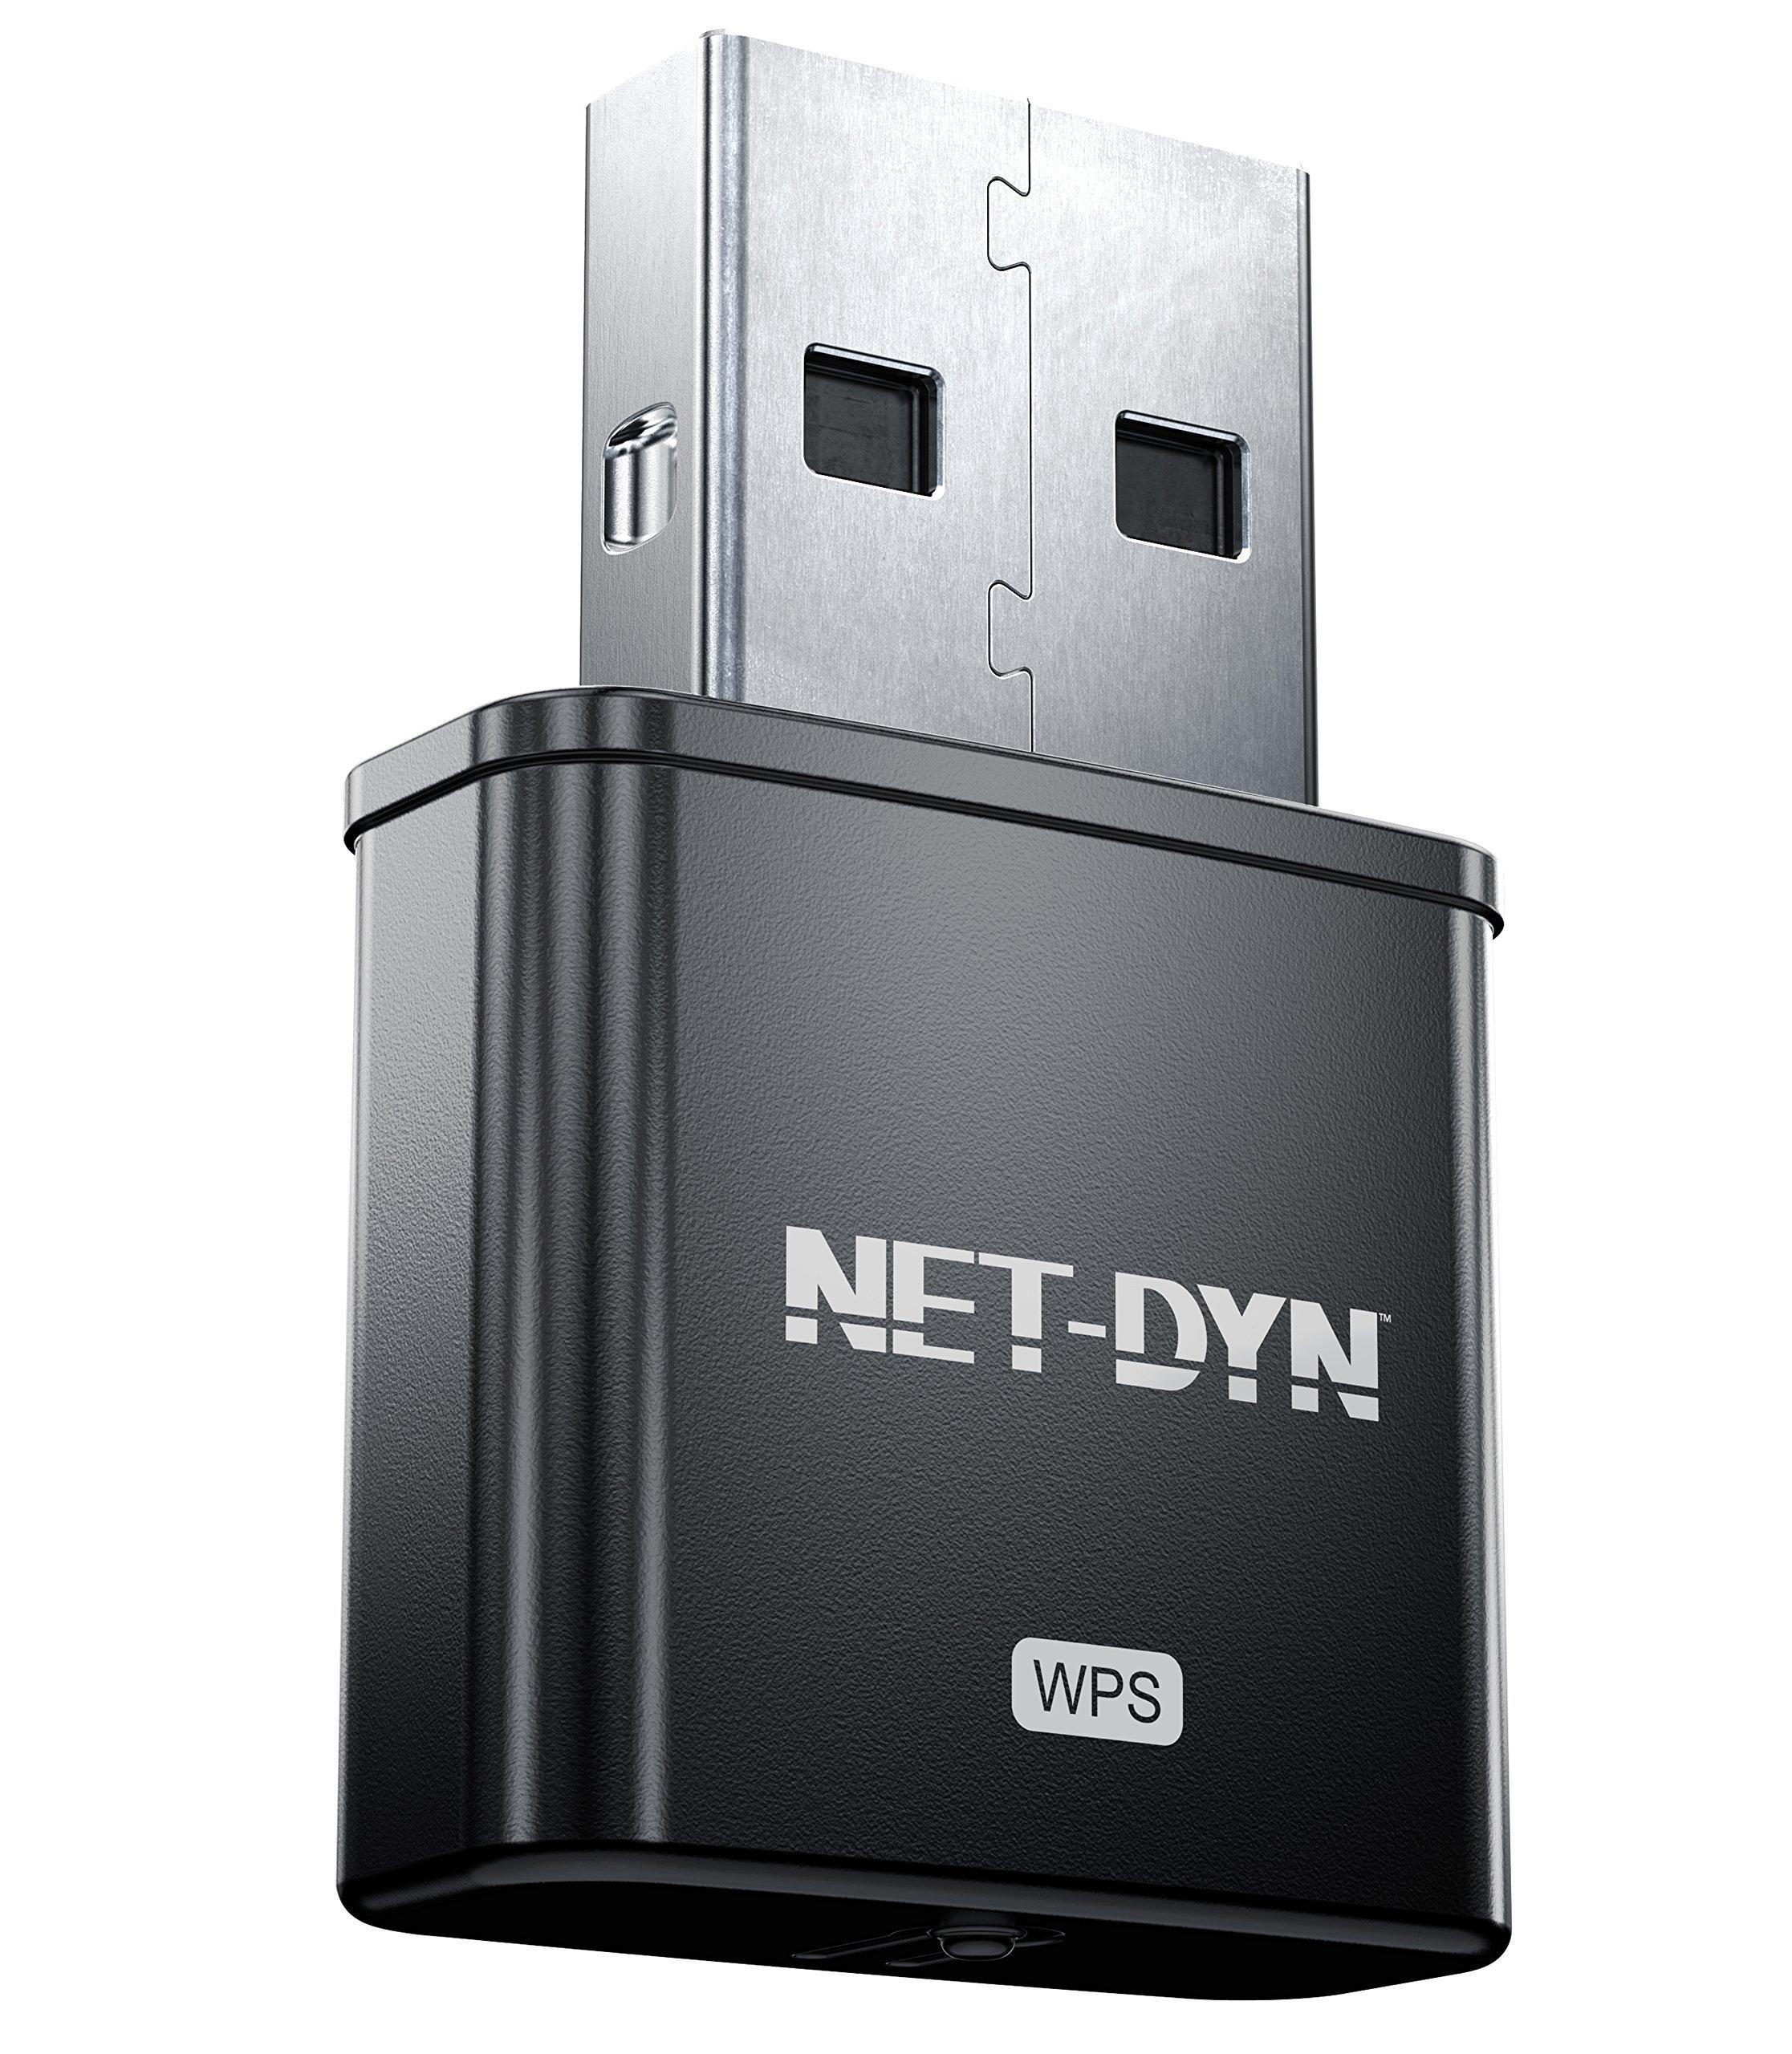 NET-DYN 300M USB WiFi Adapter Internal Antenna-300Mbps-Wireless Internet Dongle for PC Plus Mac